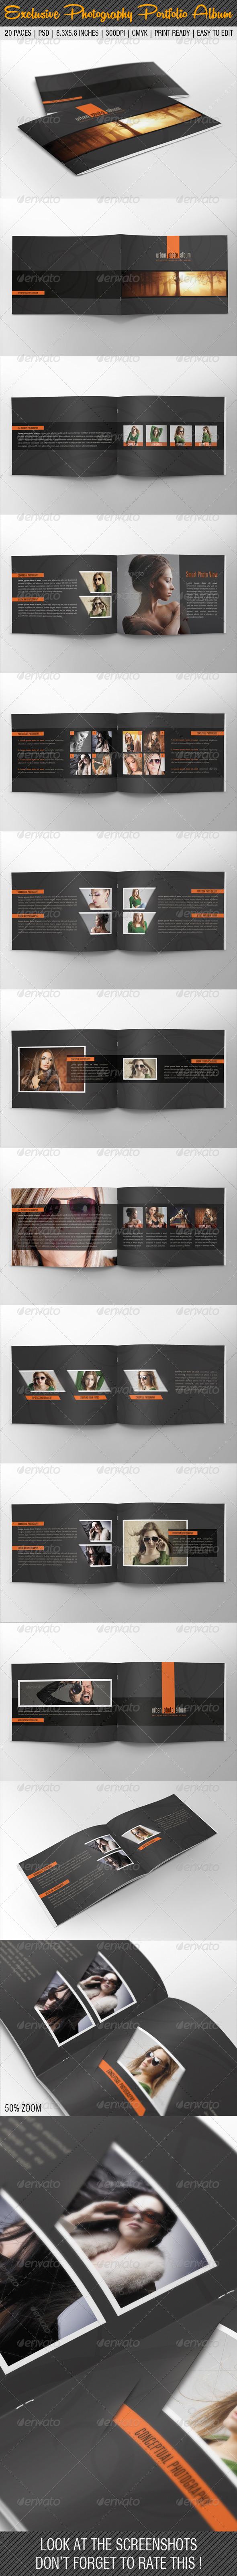 Exclusive Photography Portfolio Album 05 - Photo Albums Print Templates